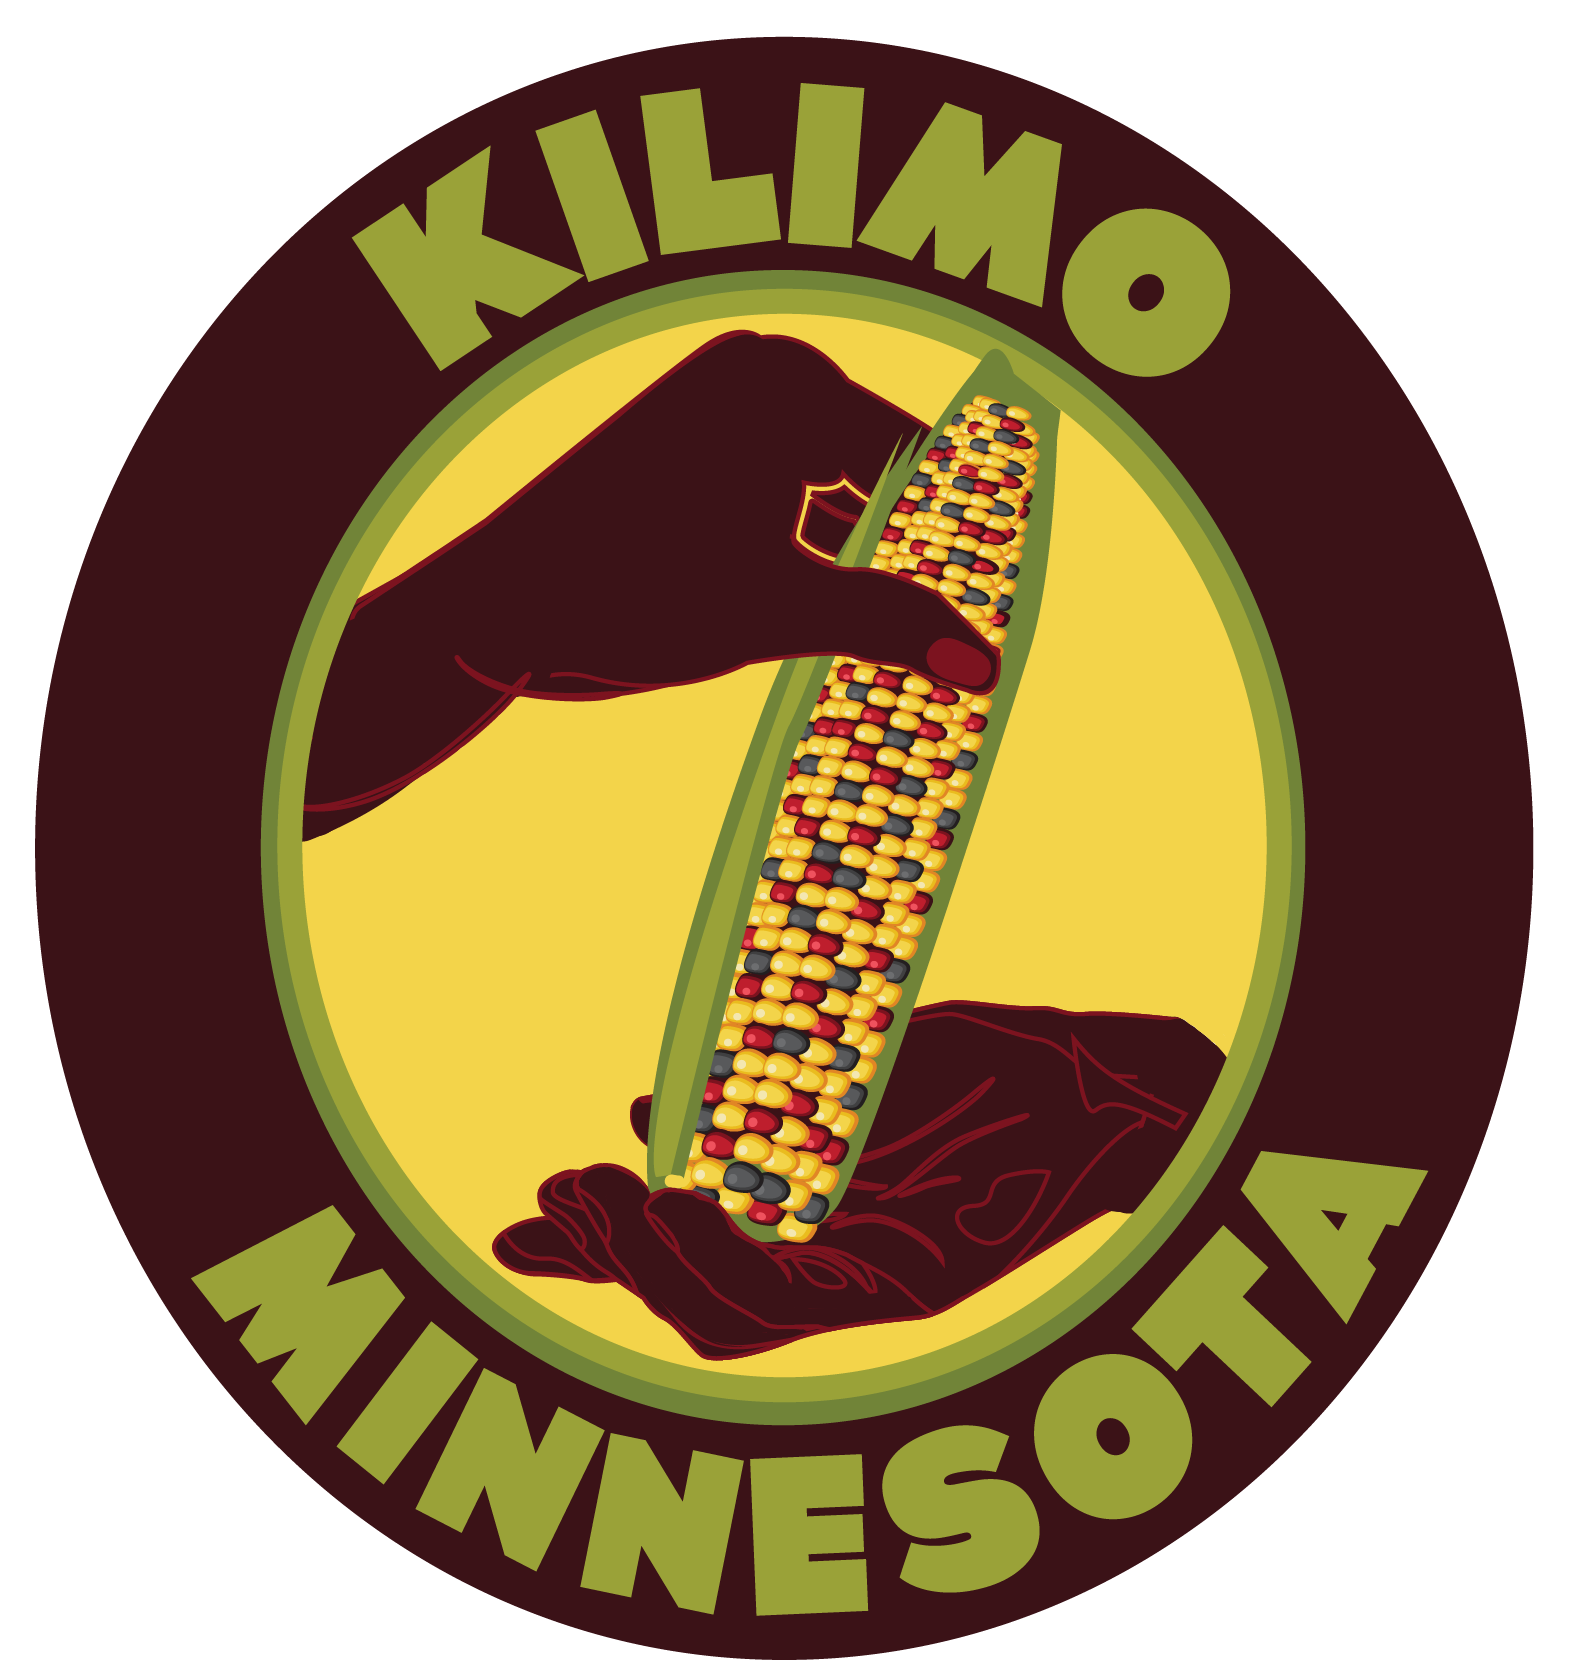 Kilimo Minnesota